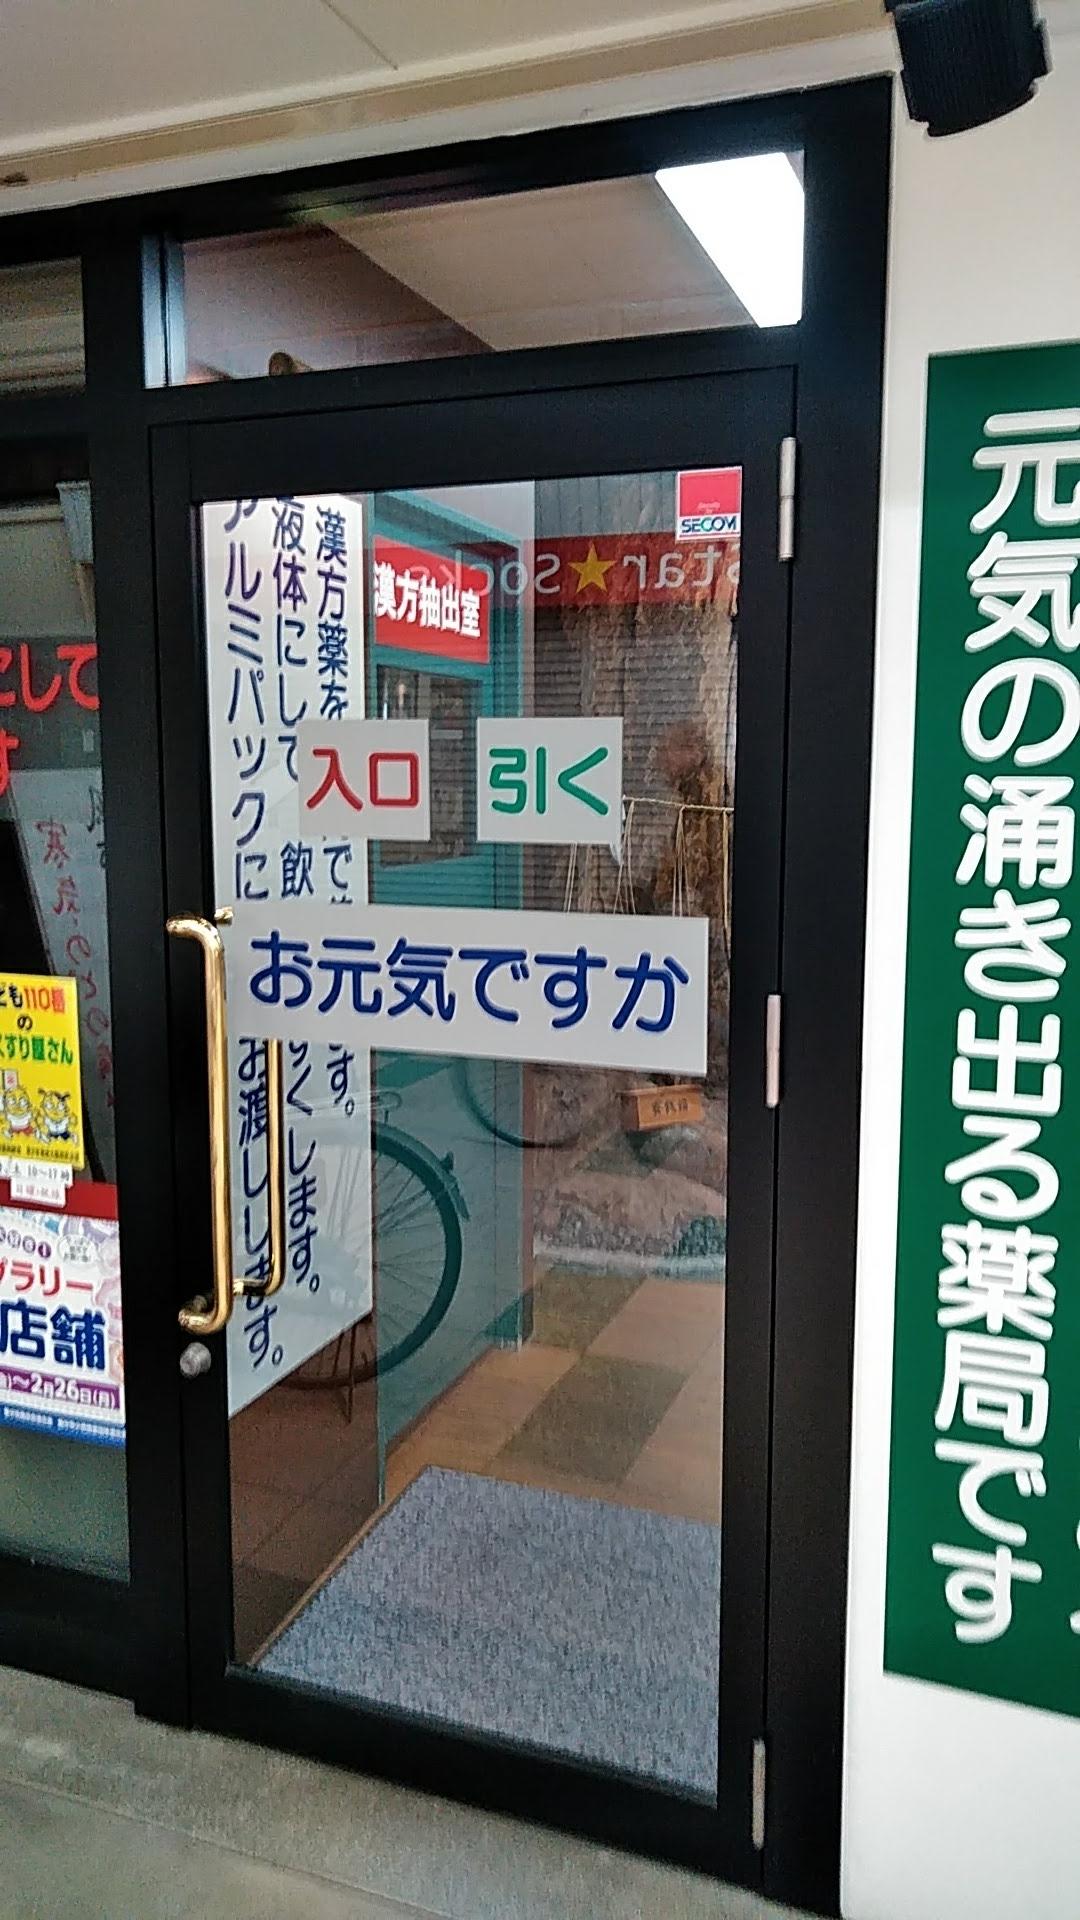 KIMG5343.jpg